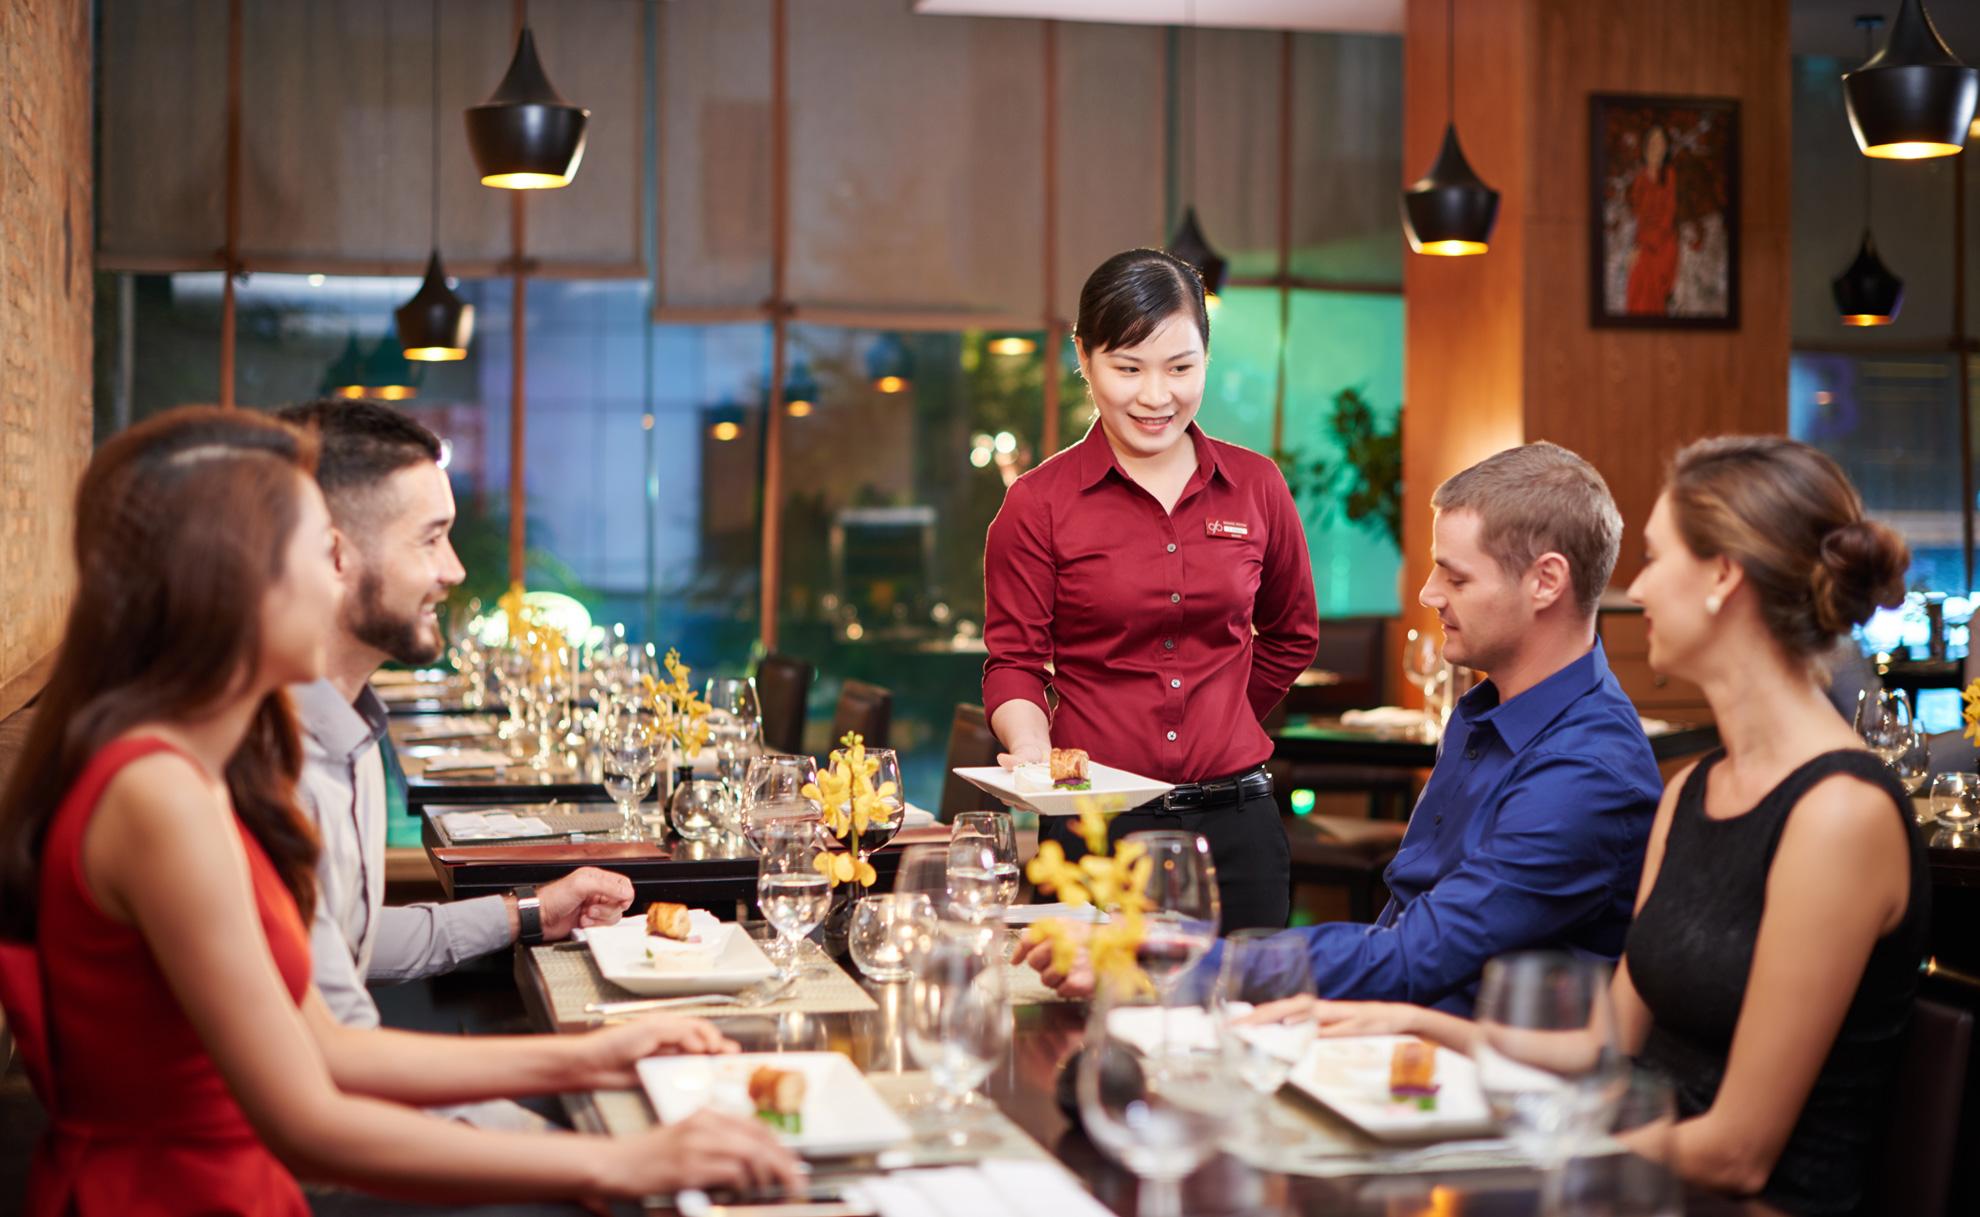 Waitress are serving food to customesa at Dining Room Restaurant Ho Chi Minh